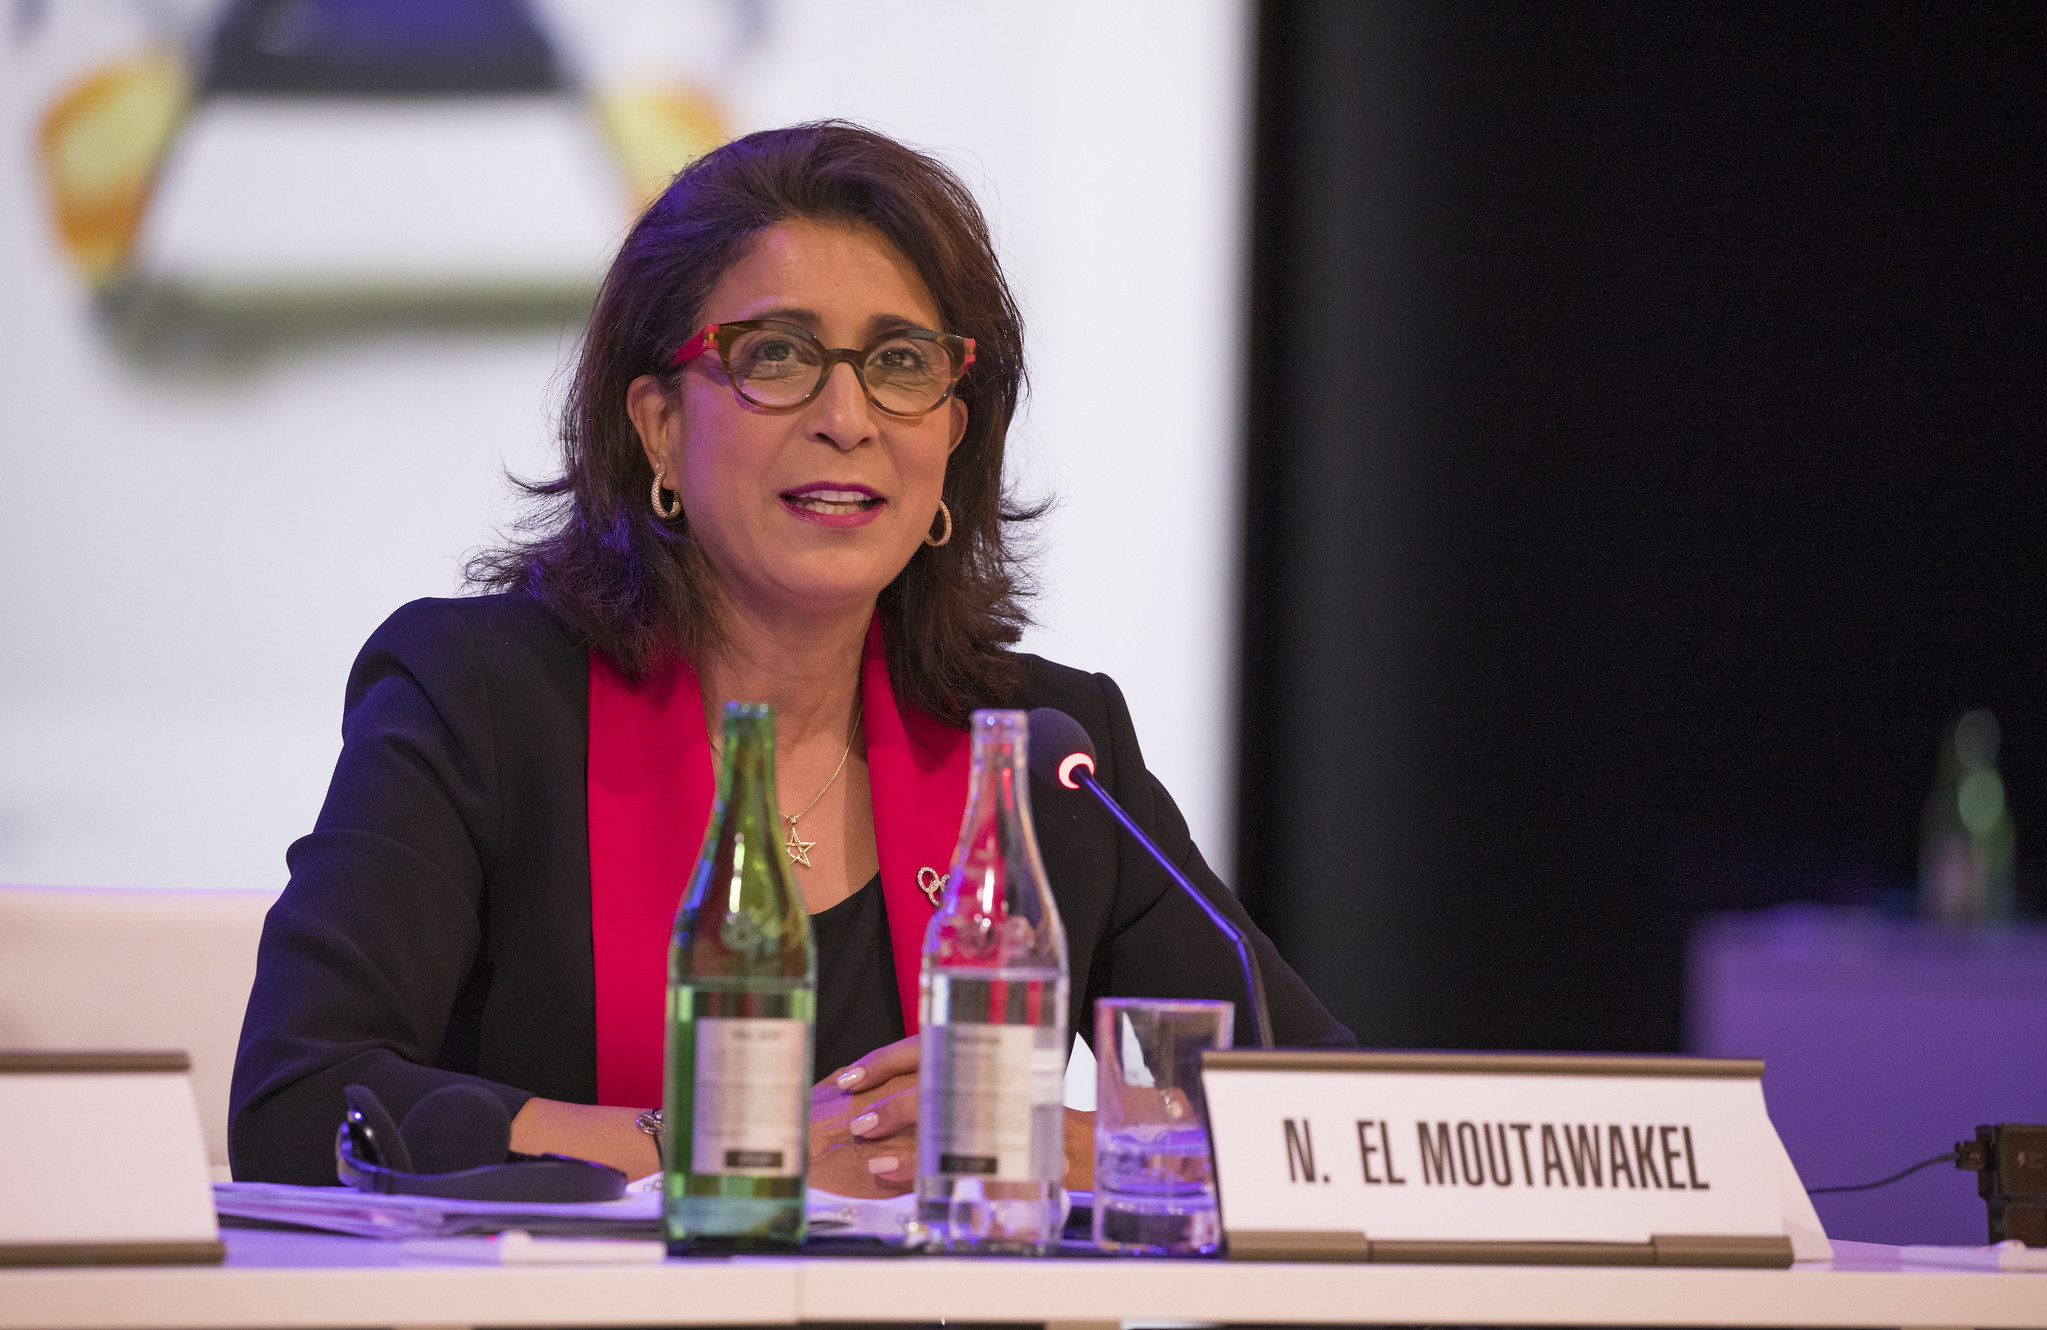 Nawal El Moutawakel will rejoin the IOC Executive Board in January ©IOC